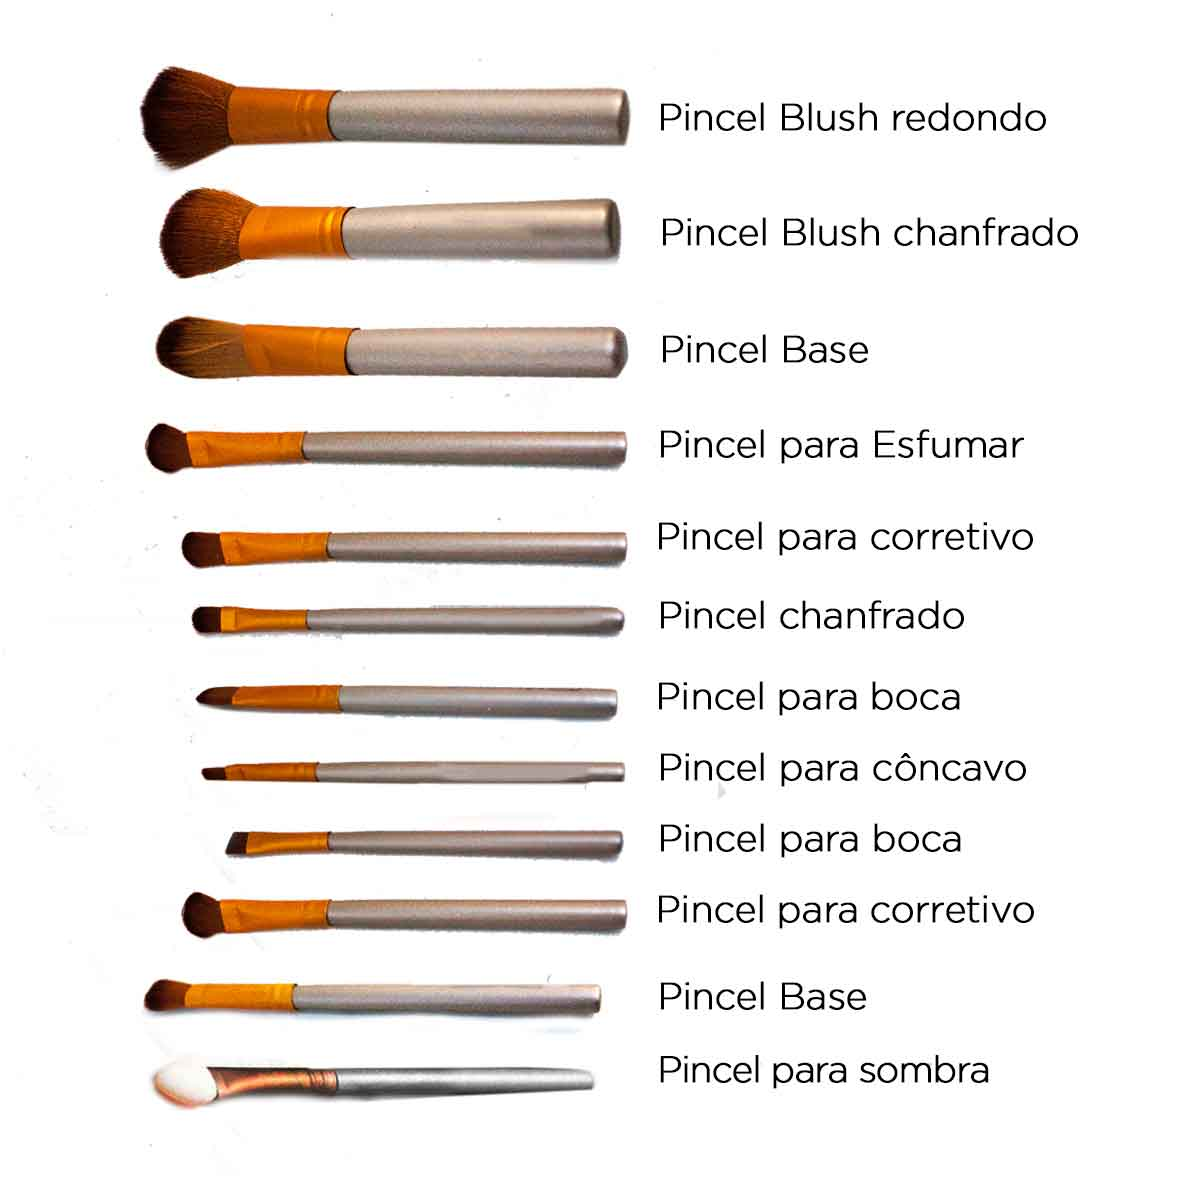 Kit 12 Pincéis Maquiagem C/ Estojo Pincel Blush